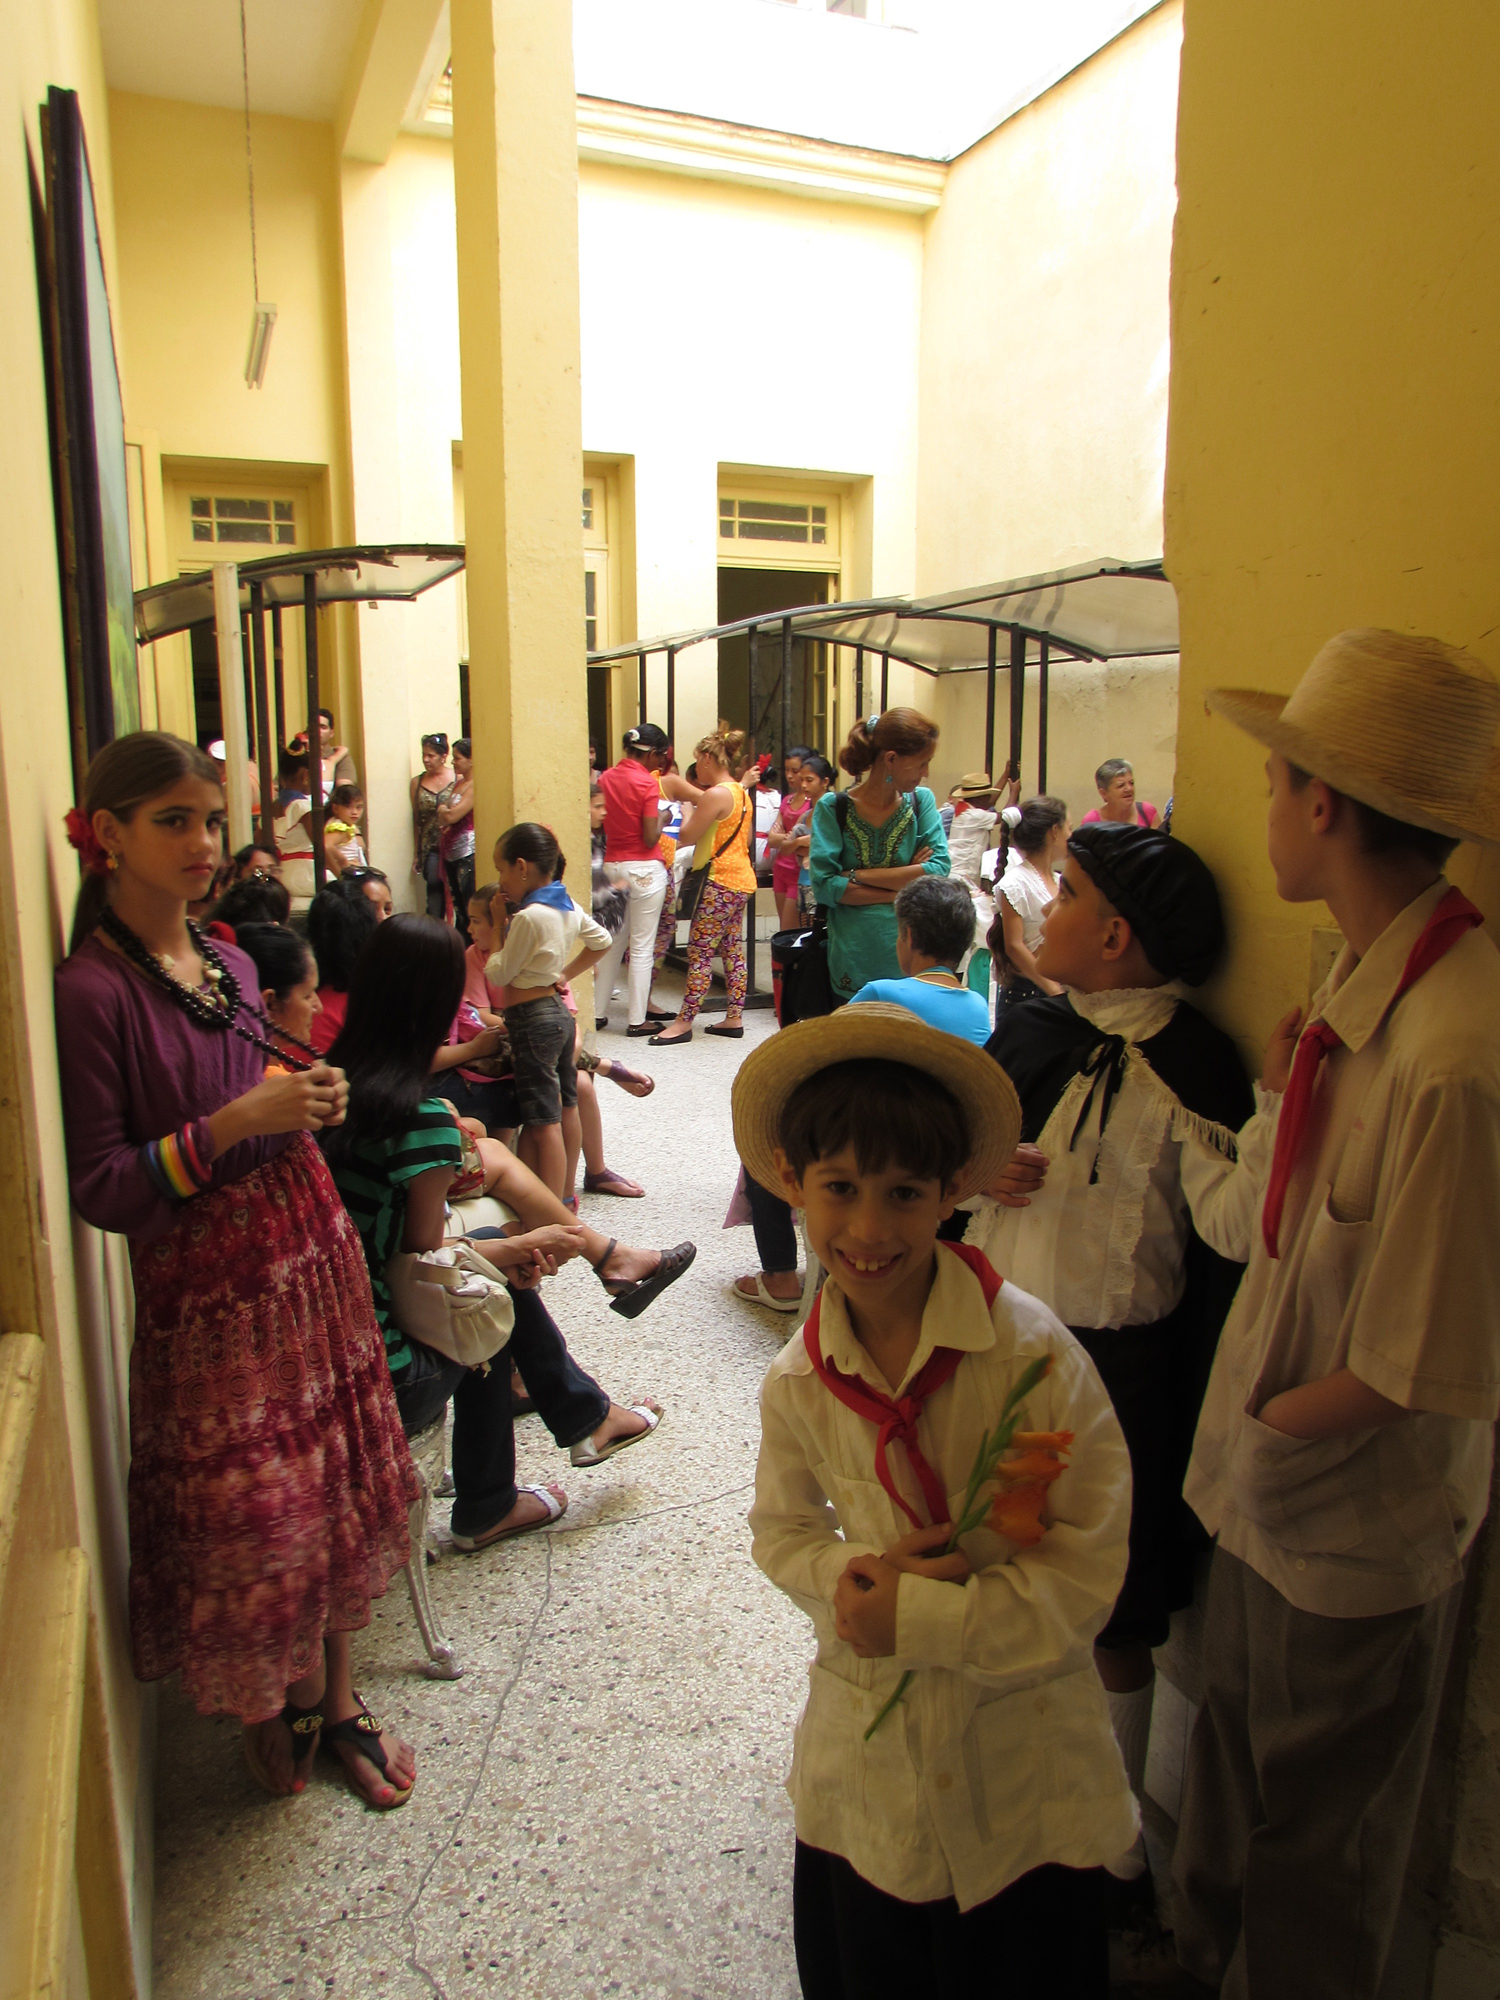 Children waiting to perform at a Santa Clara community center